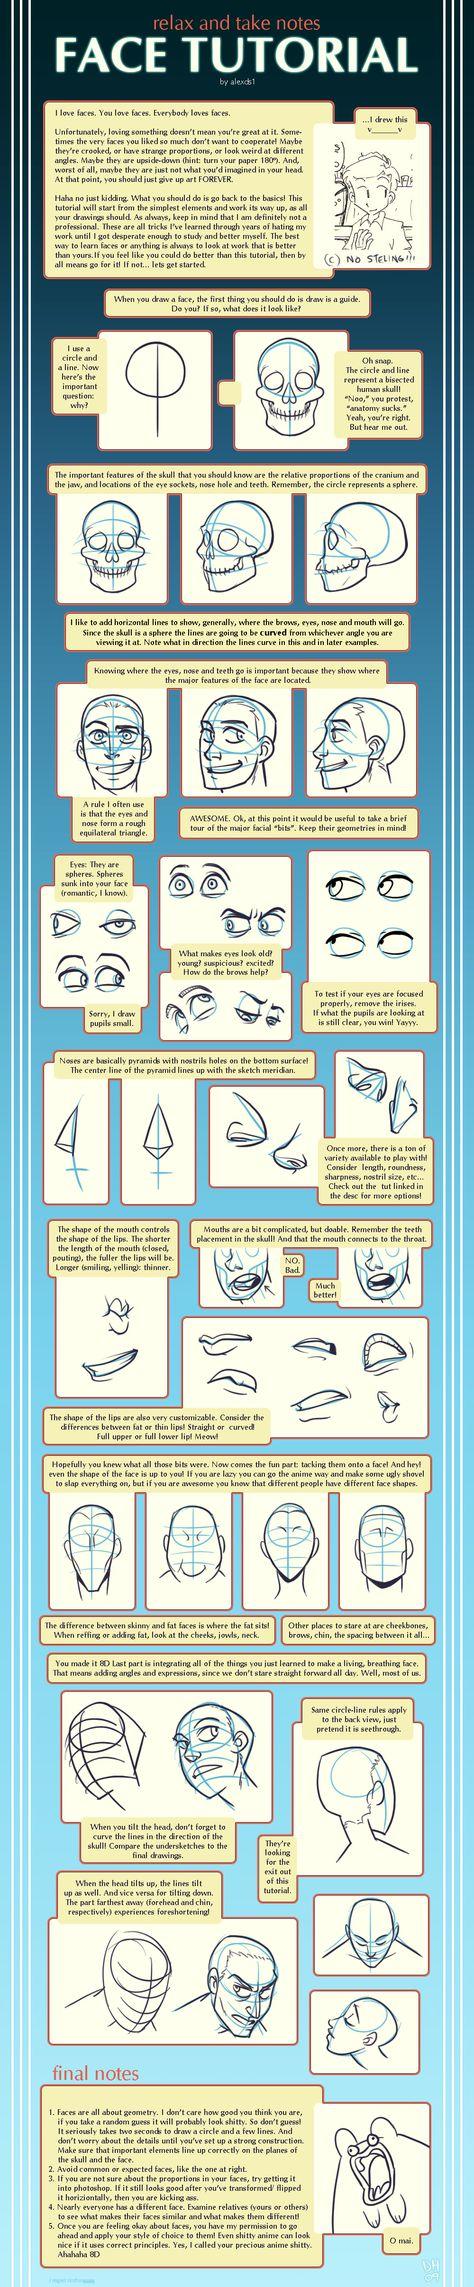 Face Tutorial by alexds1.deviantart.com on @deviantART